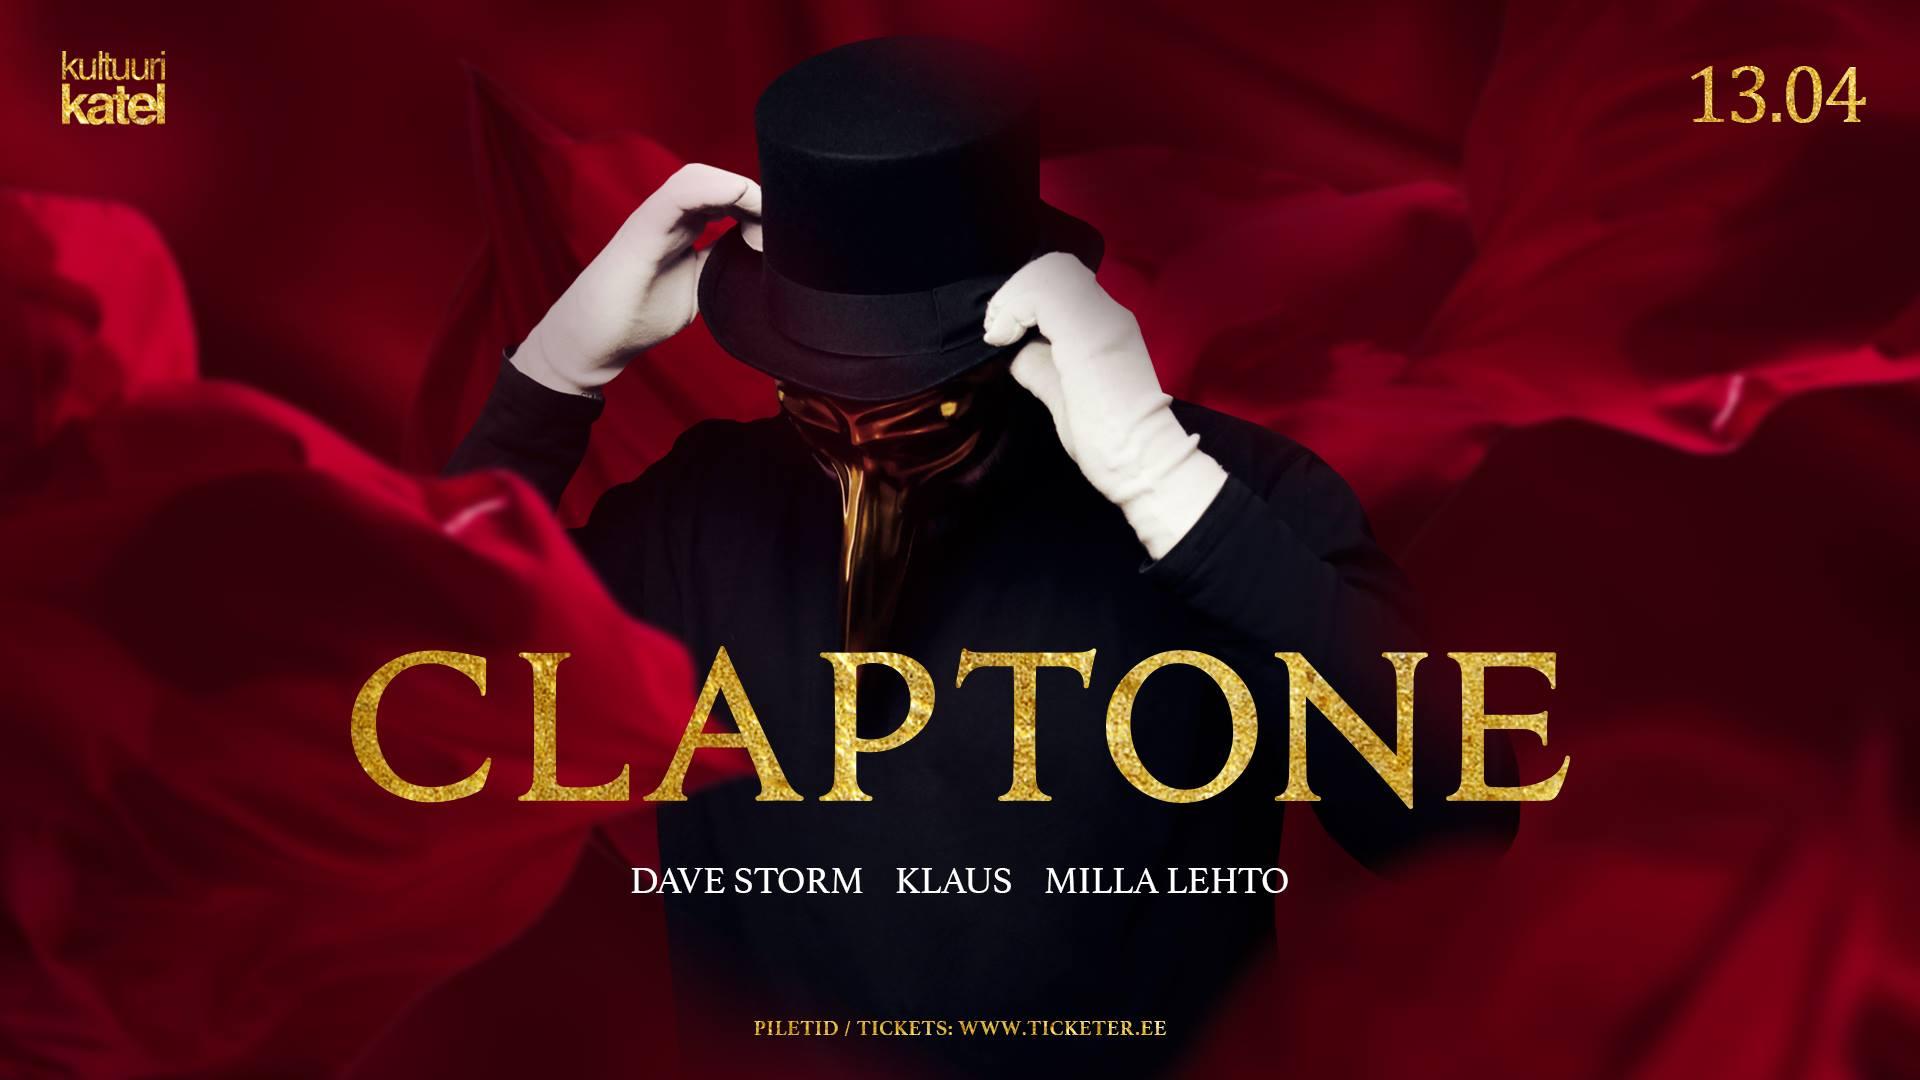 9087Claptone (DE)